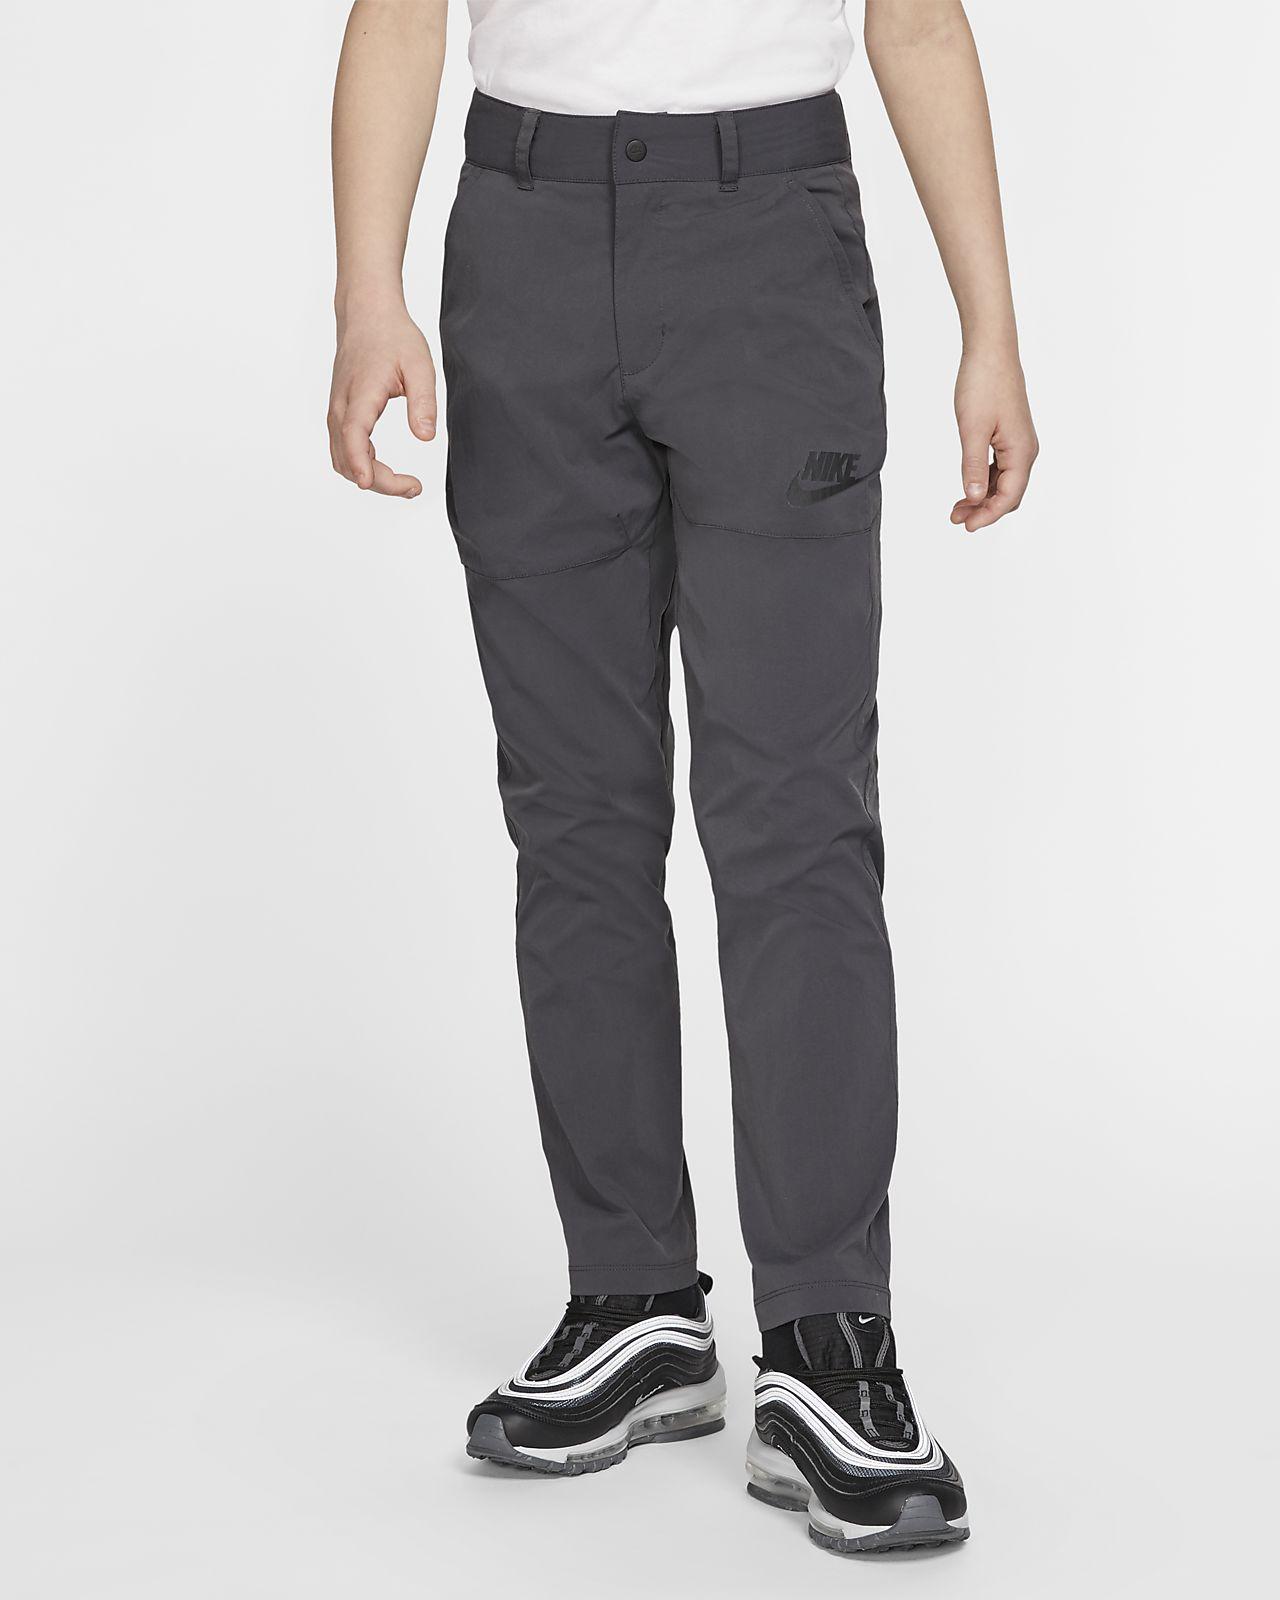 Nike Sportswear Hose für ältere Kinder. Nike BE